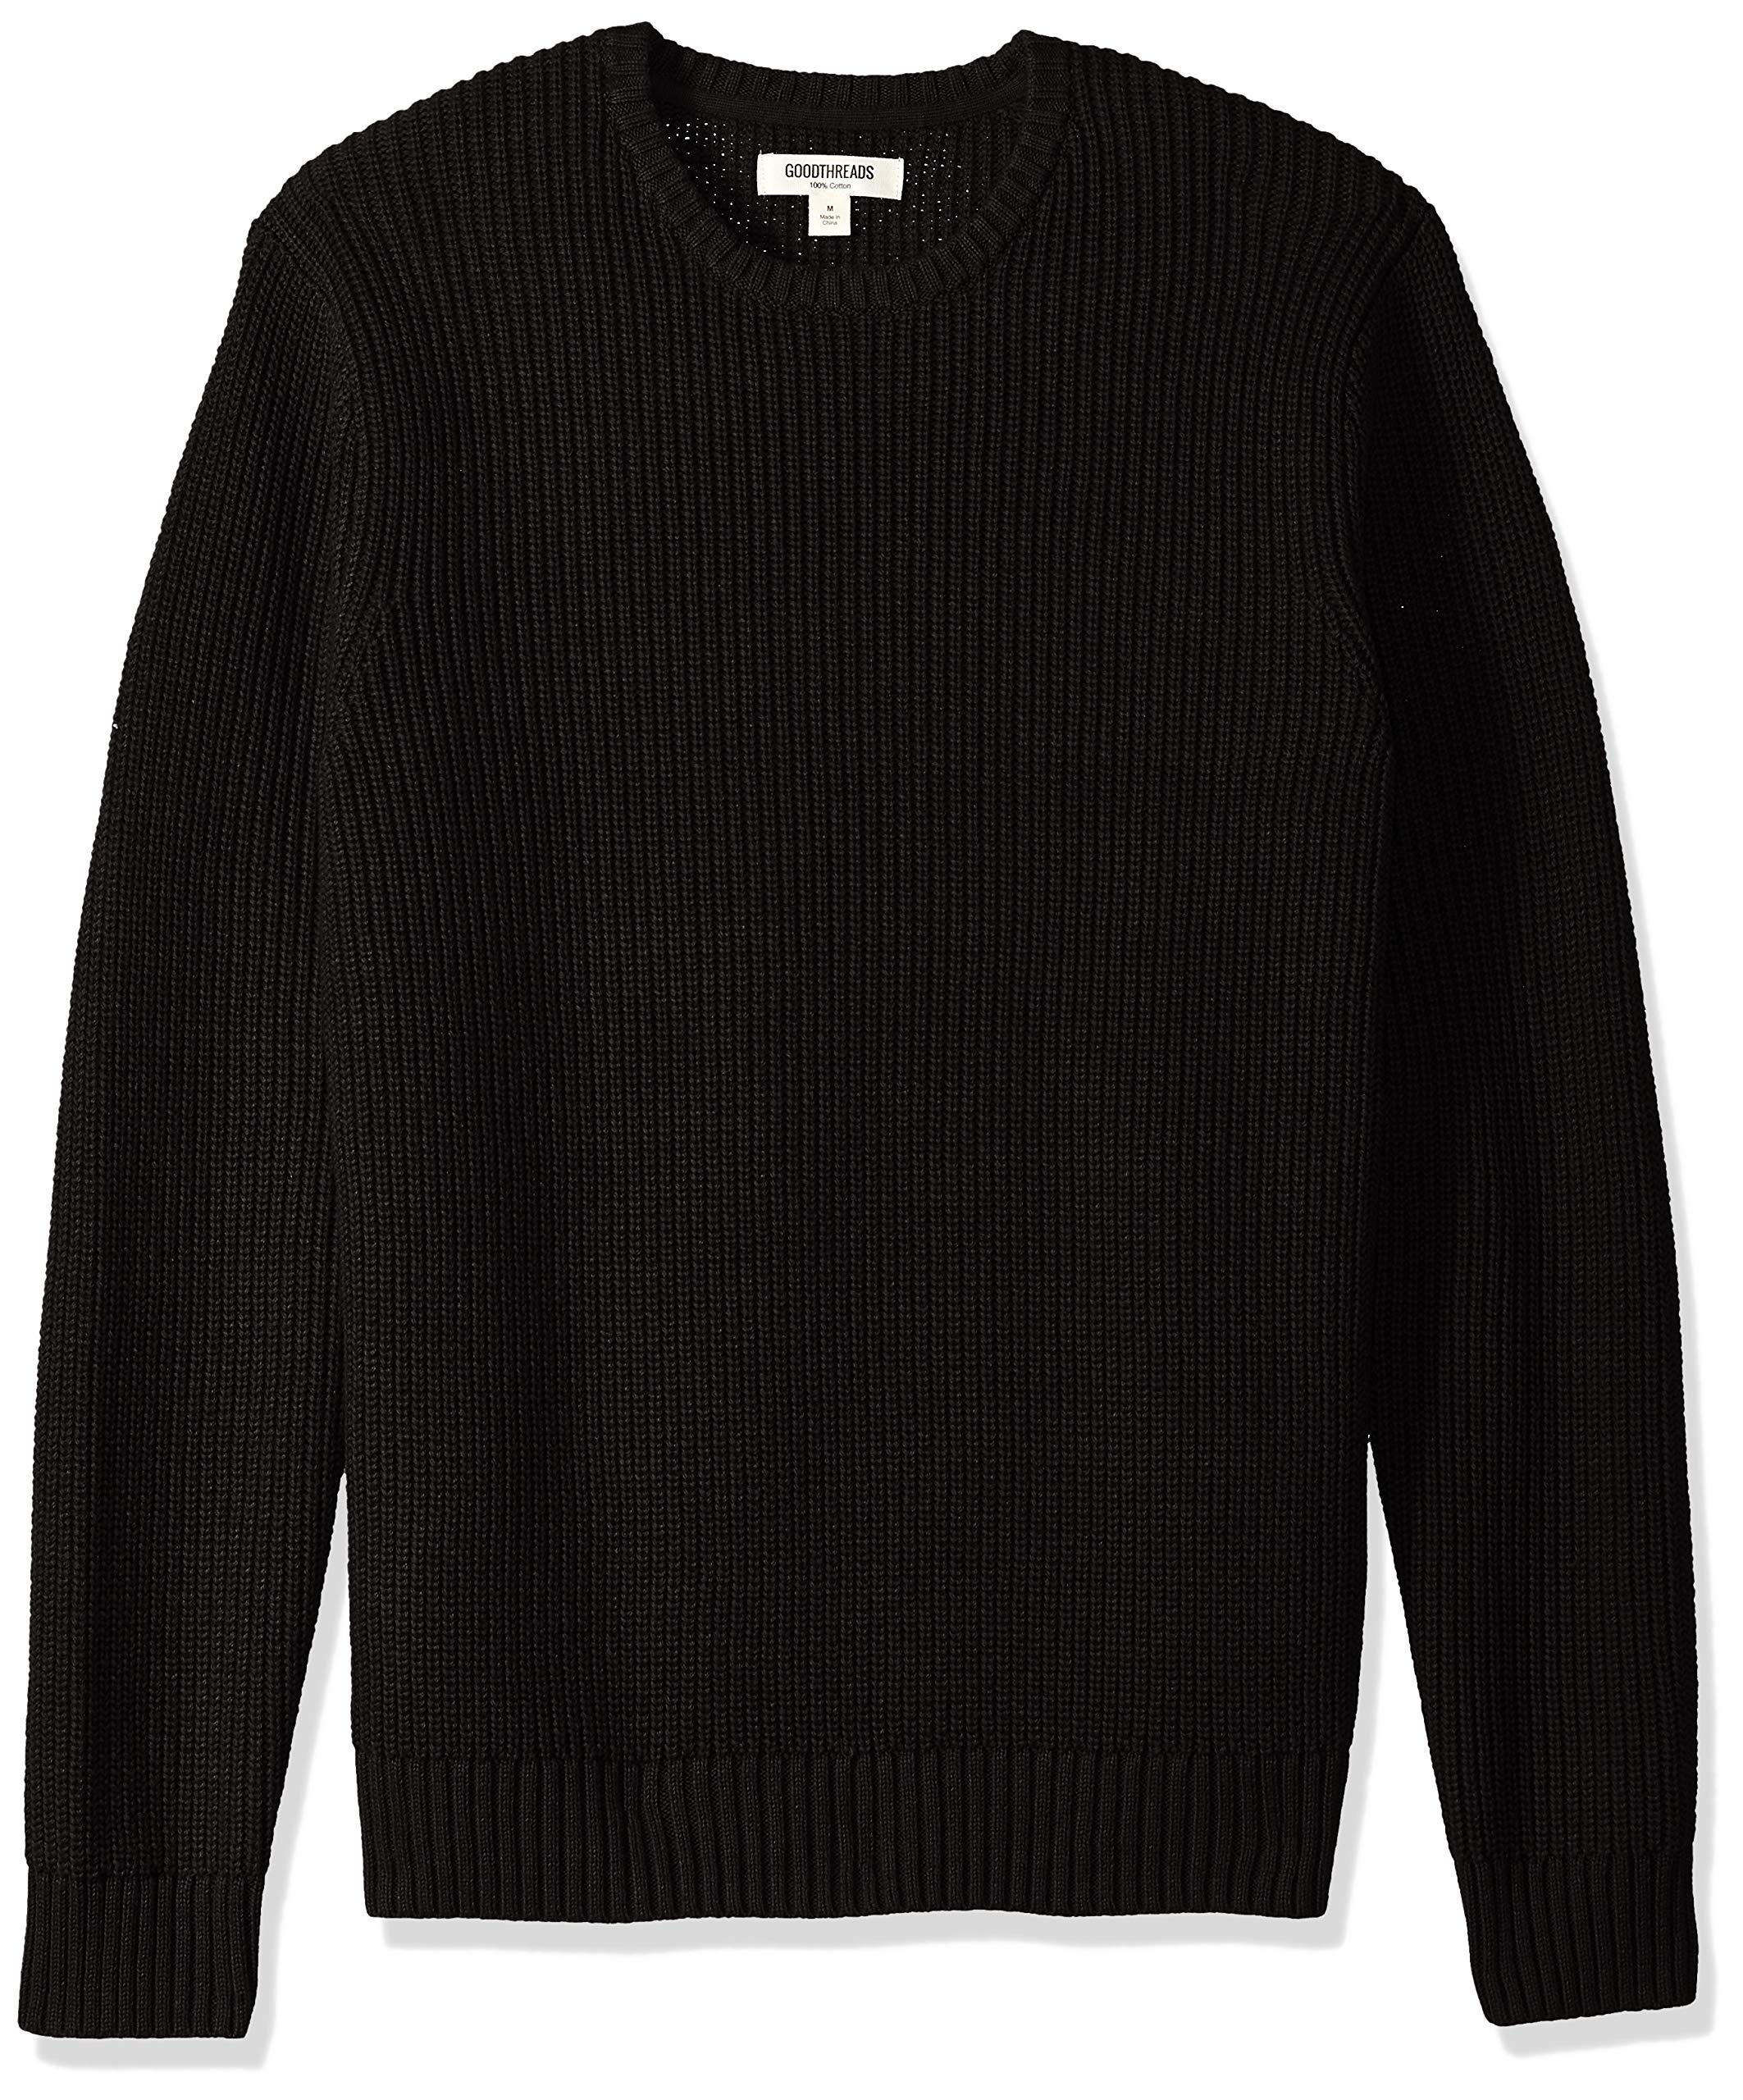 Goodthreads Men s Soft Cotton Rib Stitch Crewneck Sweater product image 7a6b44fb0